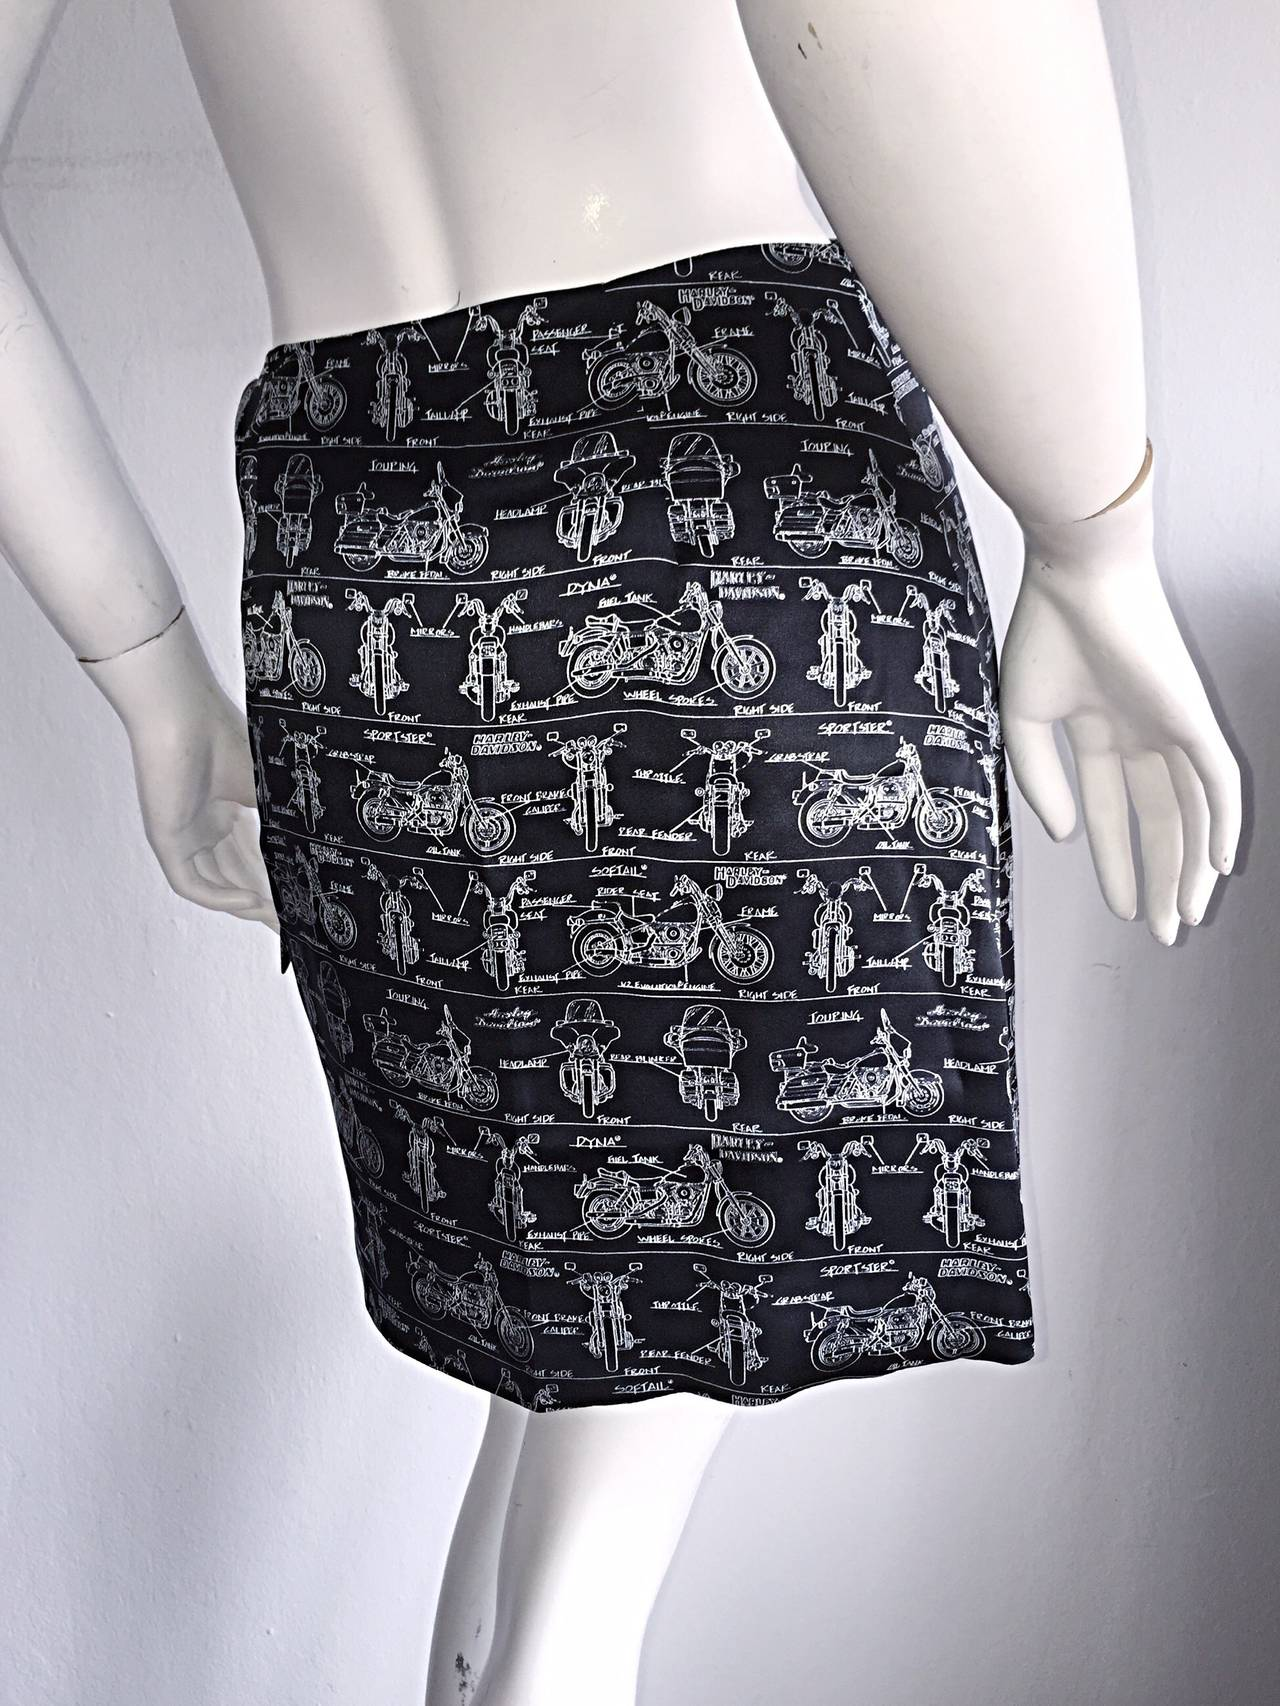 Rare Vintage Nicole Miller Limited Edition Harley Davidson Motorcycle Wrap Skirt For Sale At 1stdibs